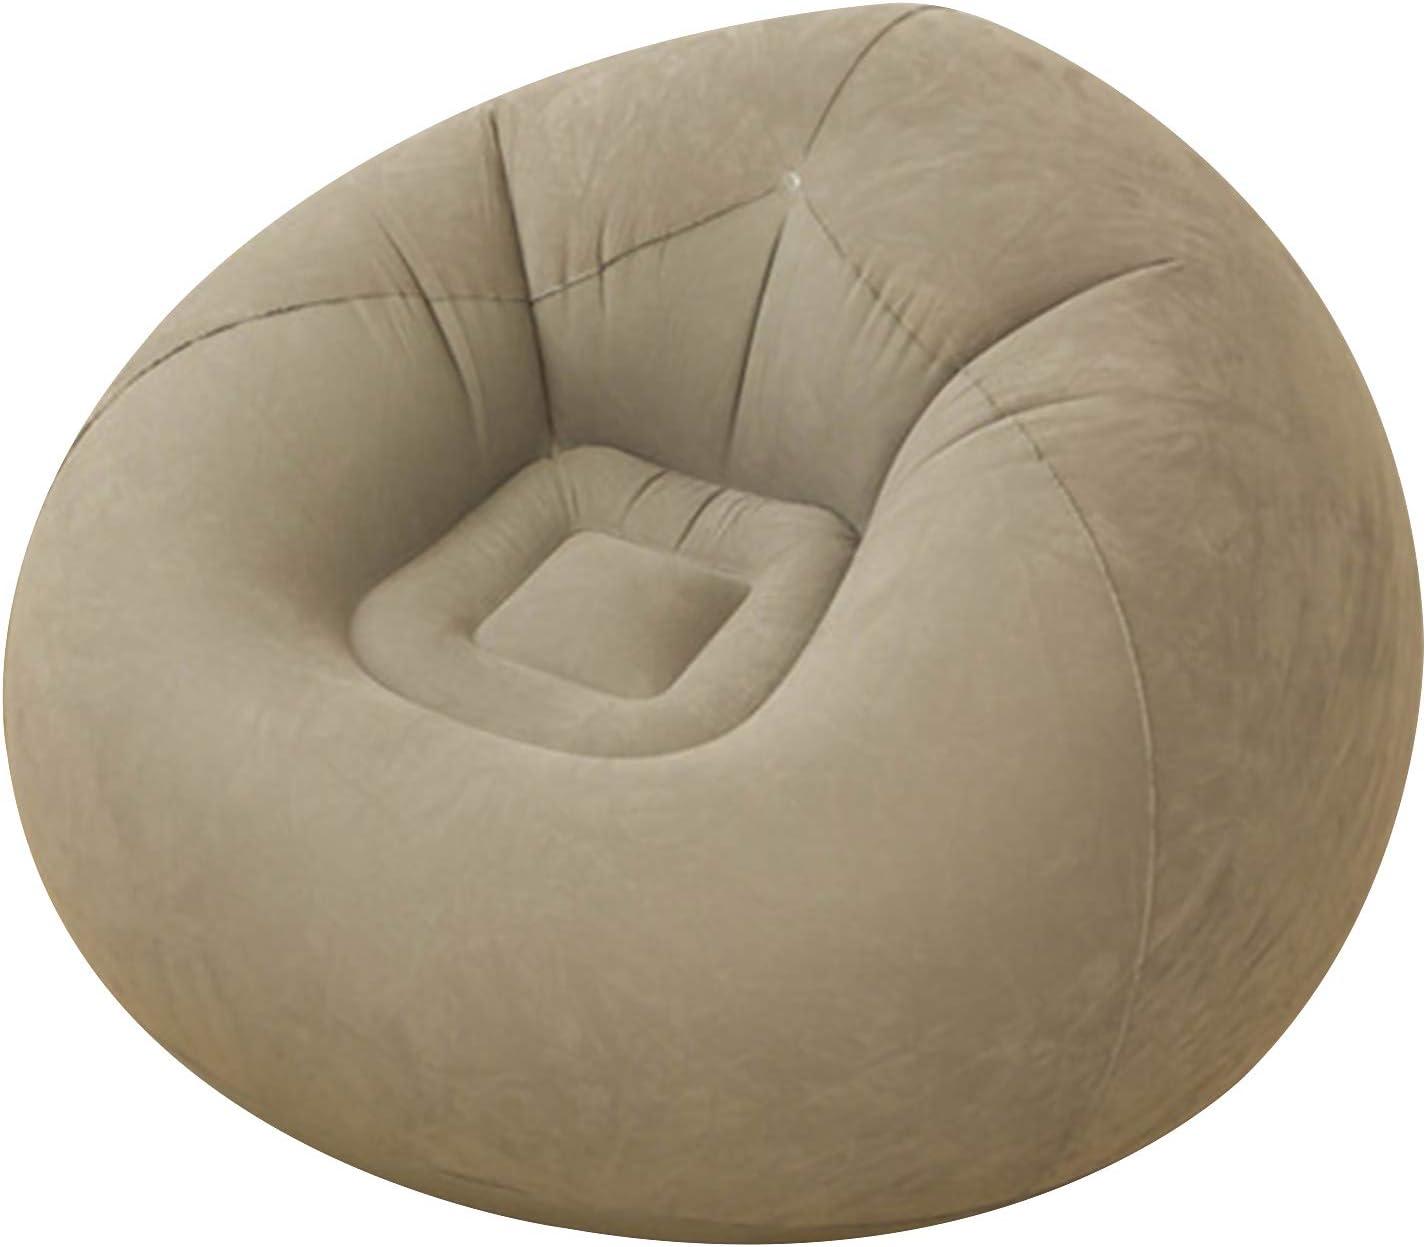 CHENGAI Inflatable Bean Bag Chair Foldable セール特価 新作販売 Flocking